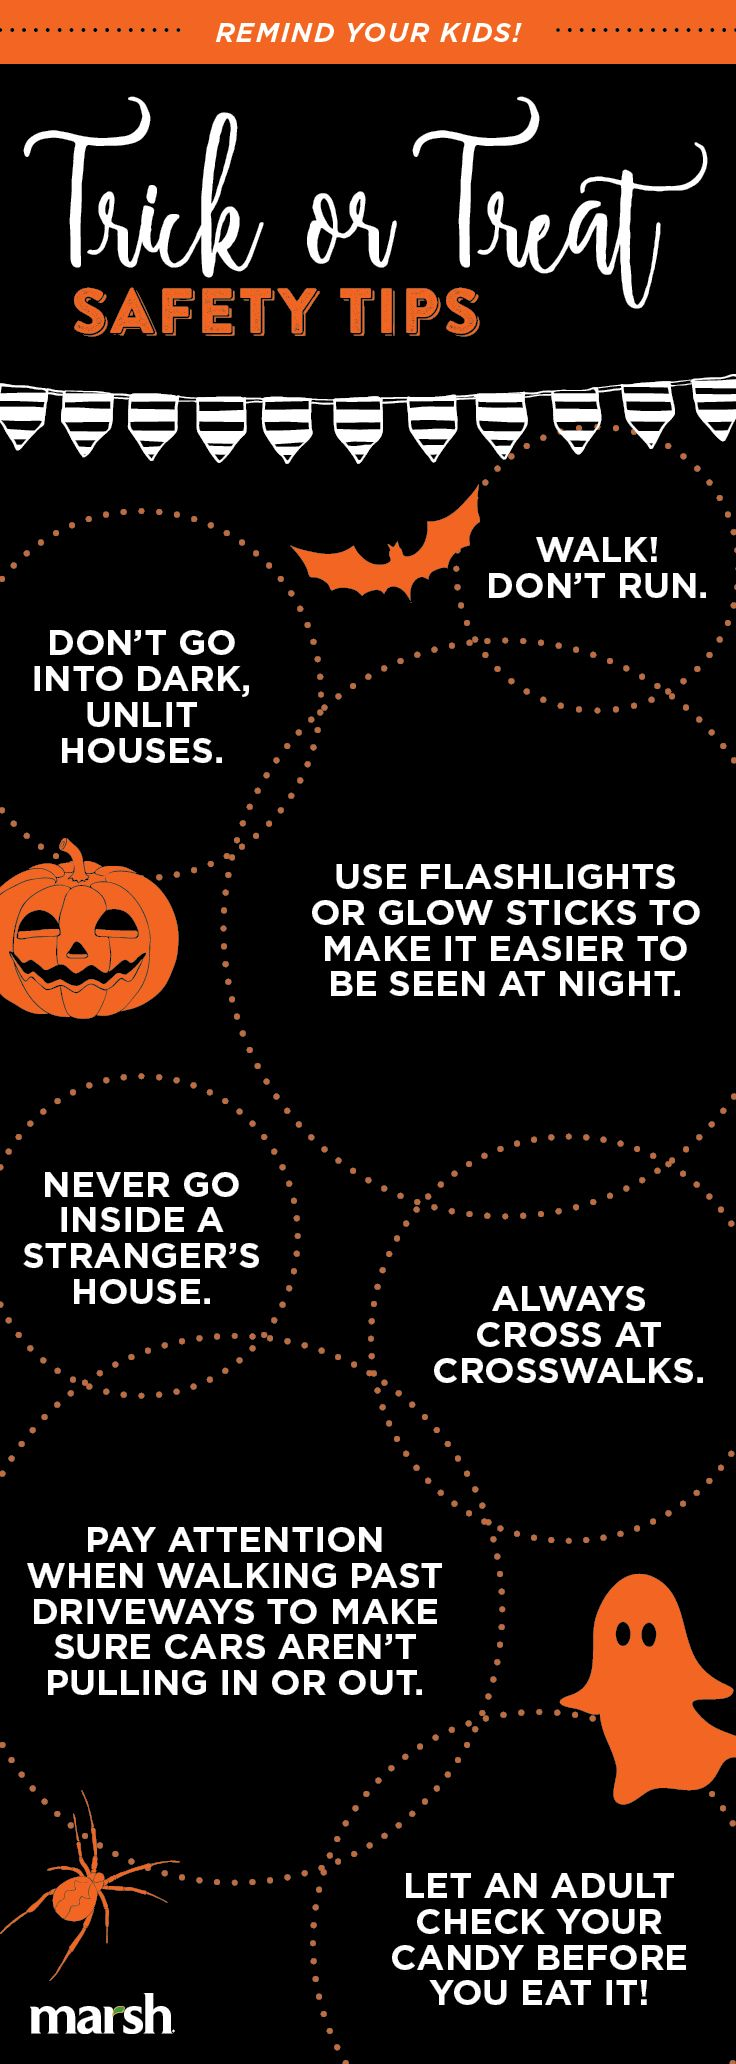 17 Best images about Halloween on Pinterest | Pumpkins, Candy corn ...